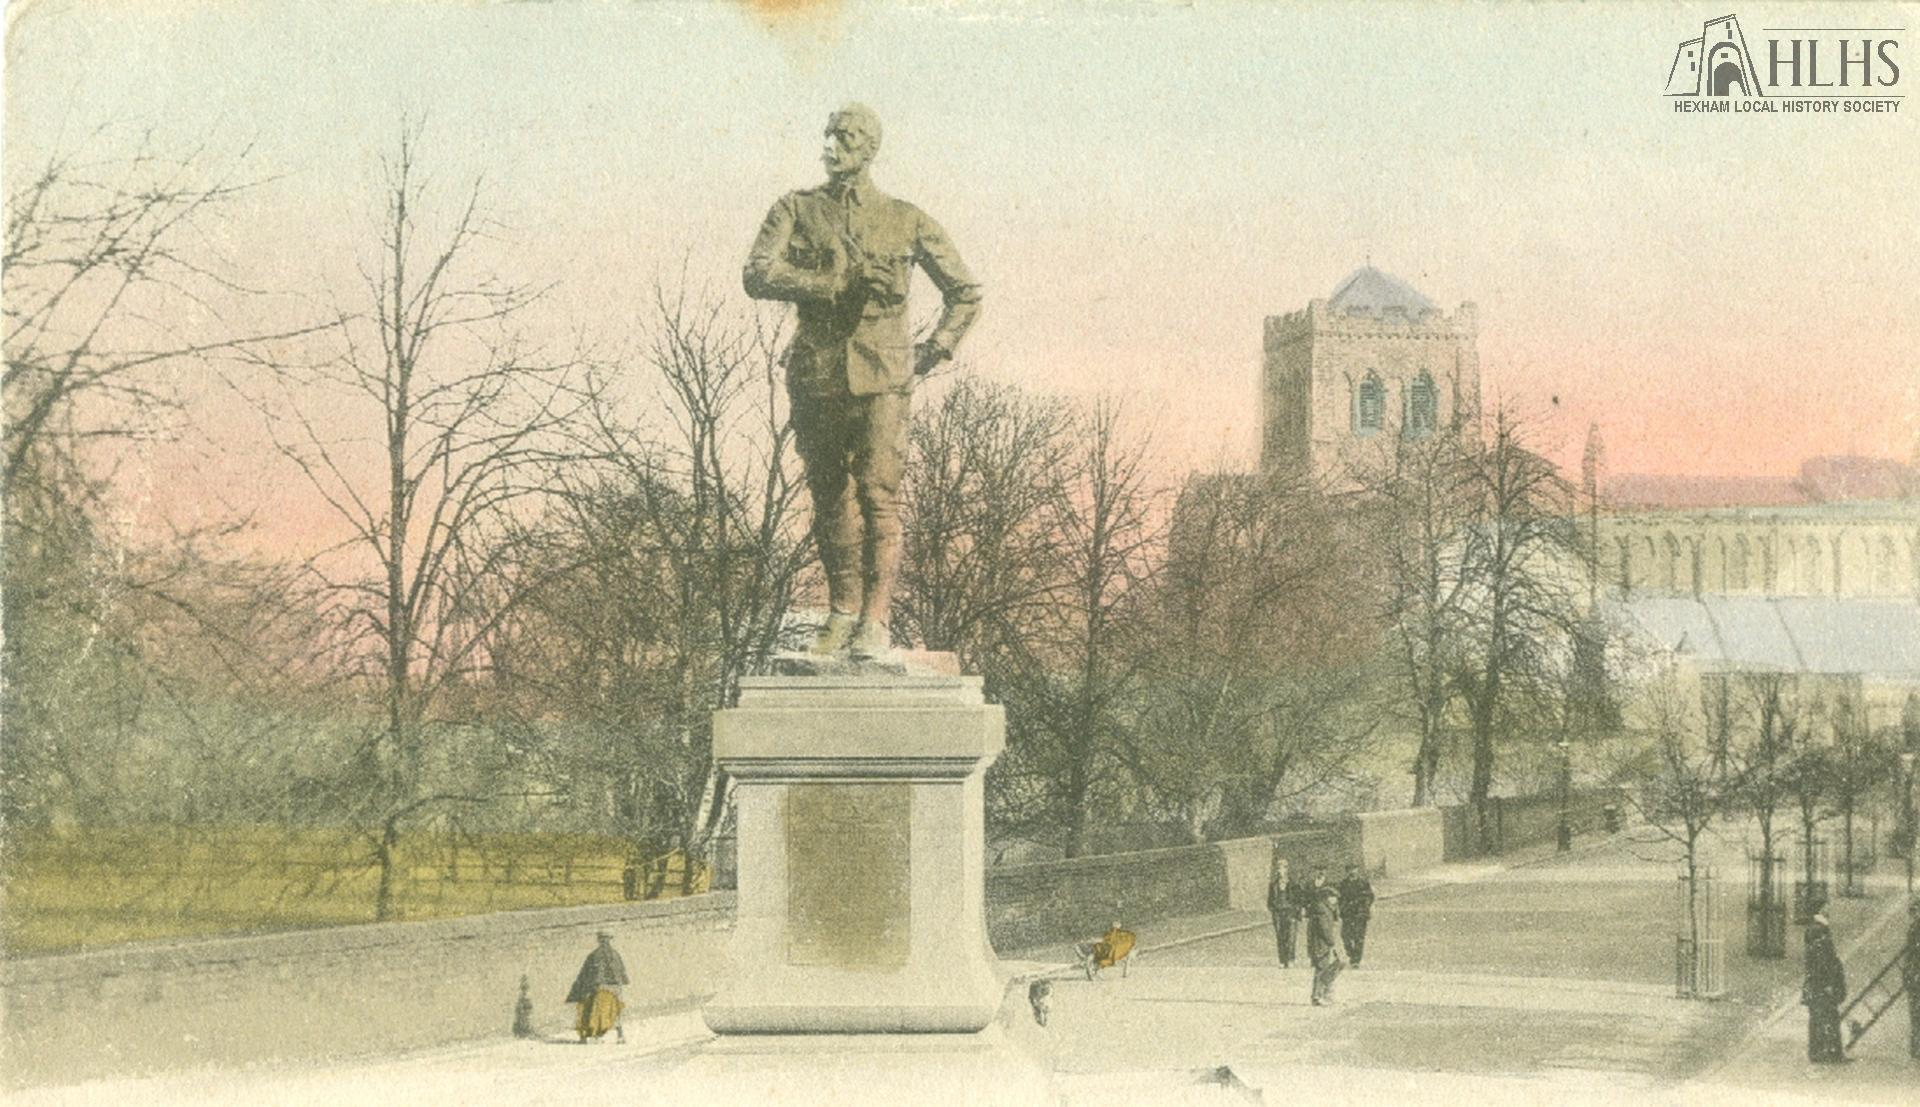 1905: Benson Monument, Hexham. Tinted; looking N